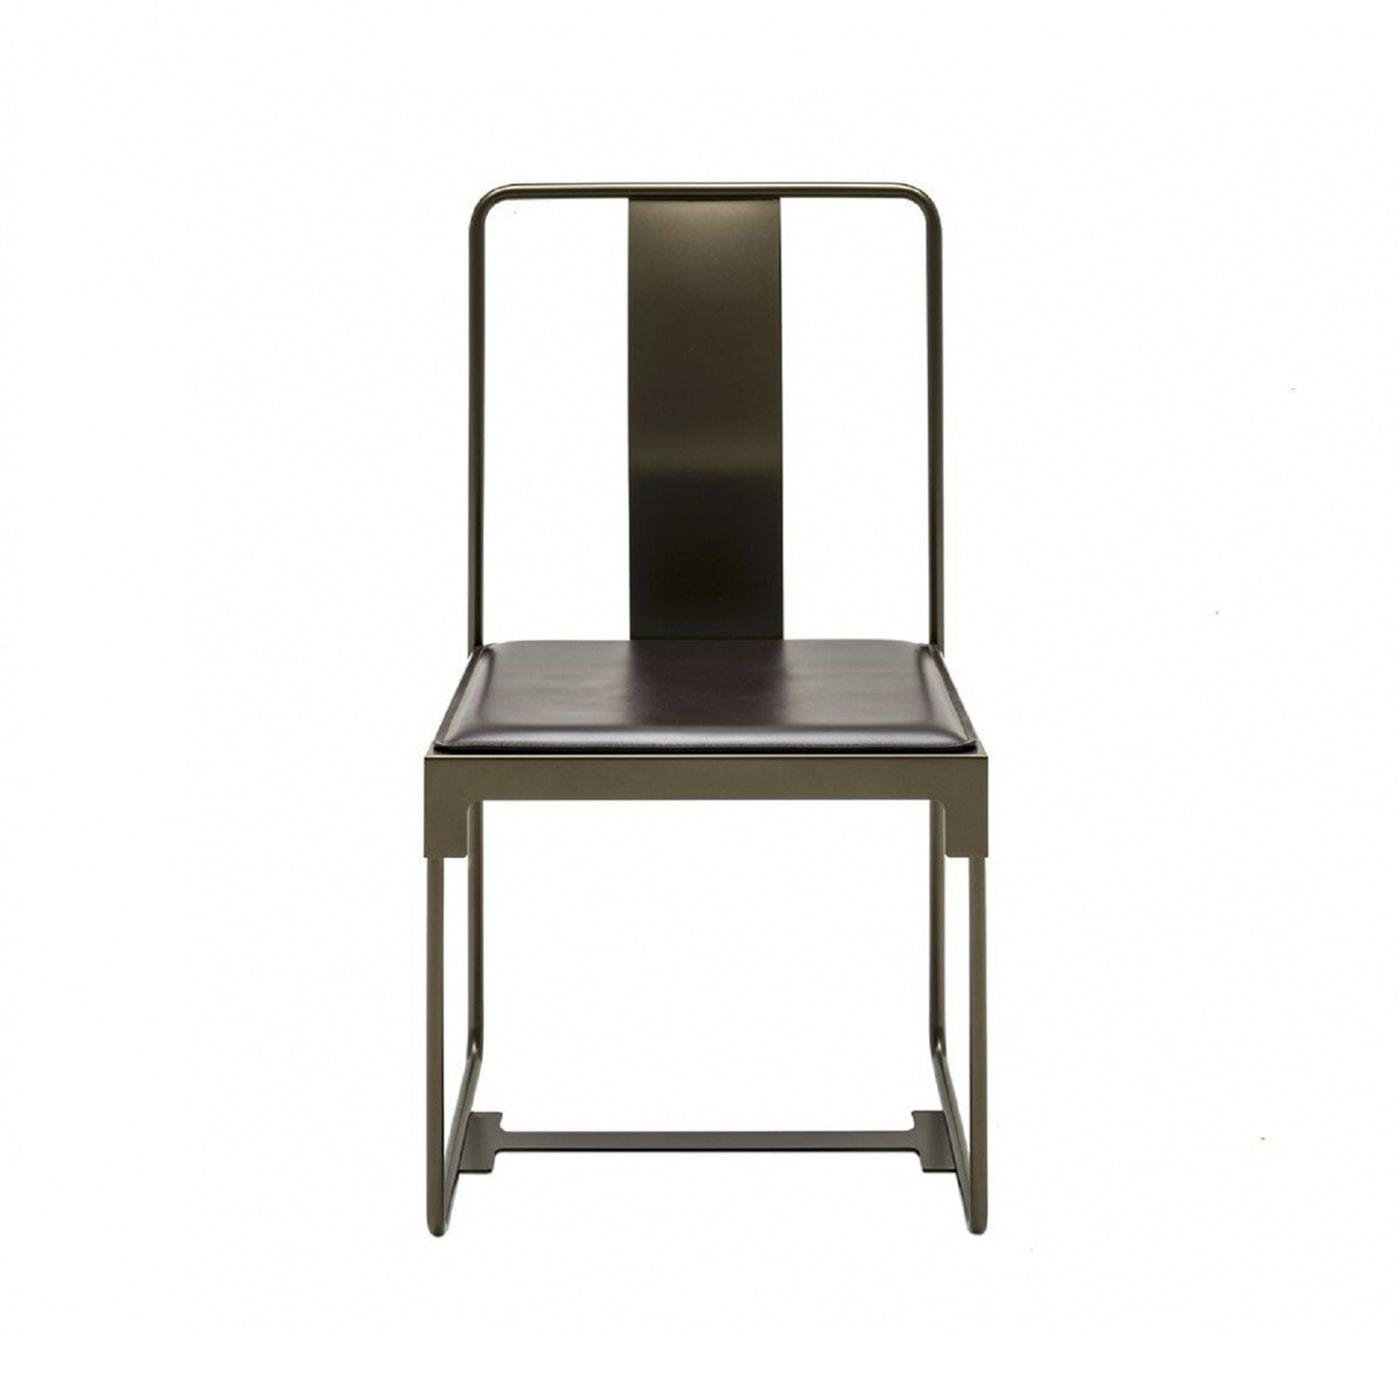 Driade Mingx sedia in acciaio e cuoio - shop online